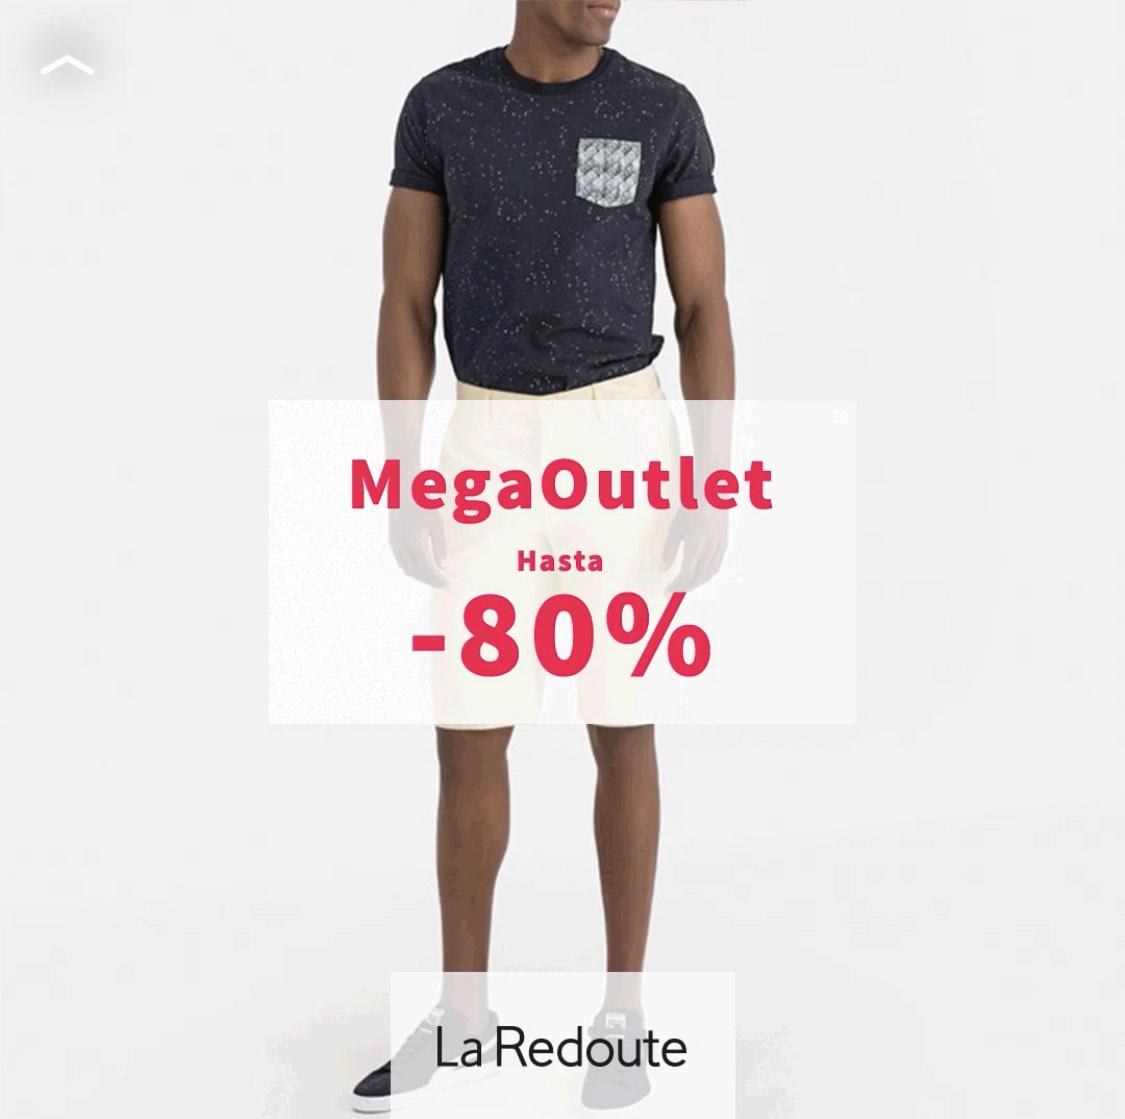 MegaOutlet - La Redoute -- Hasta el 80% de dto